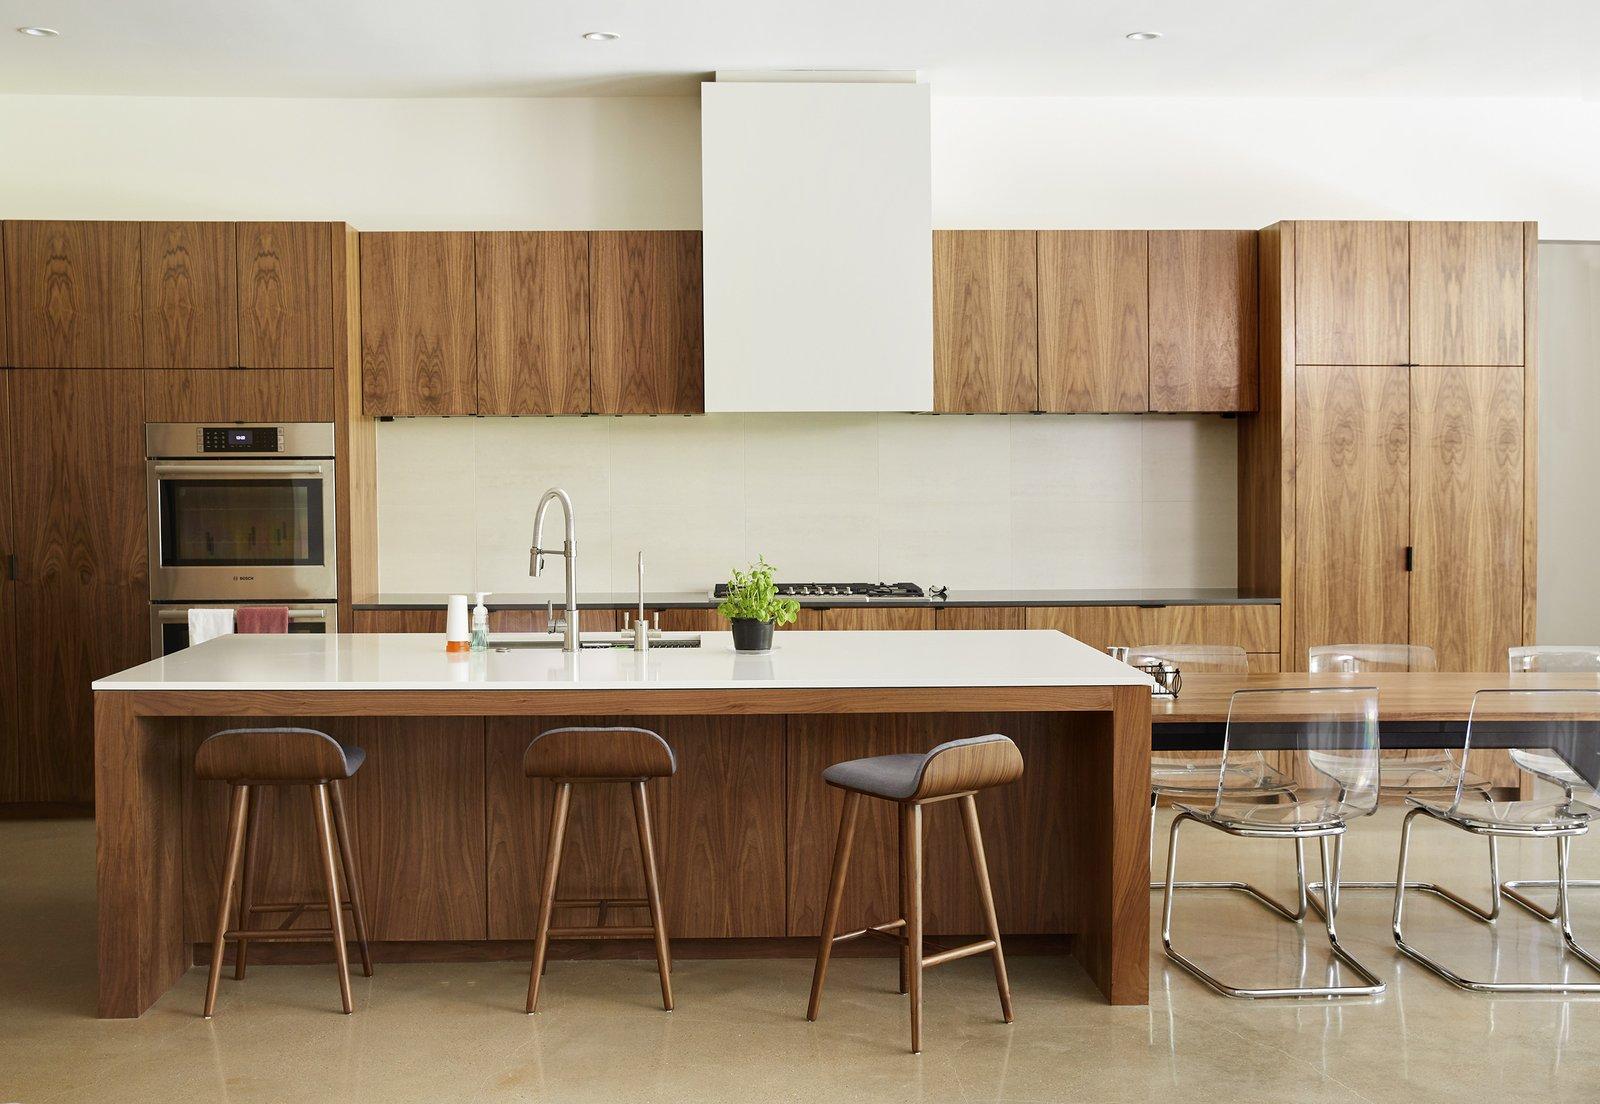 StudioMET Architects Westview Residence wood kitchen